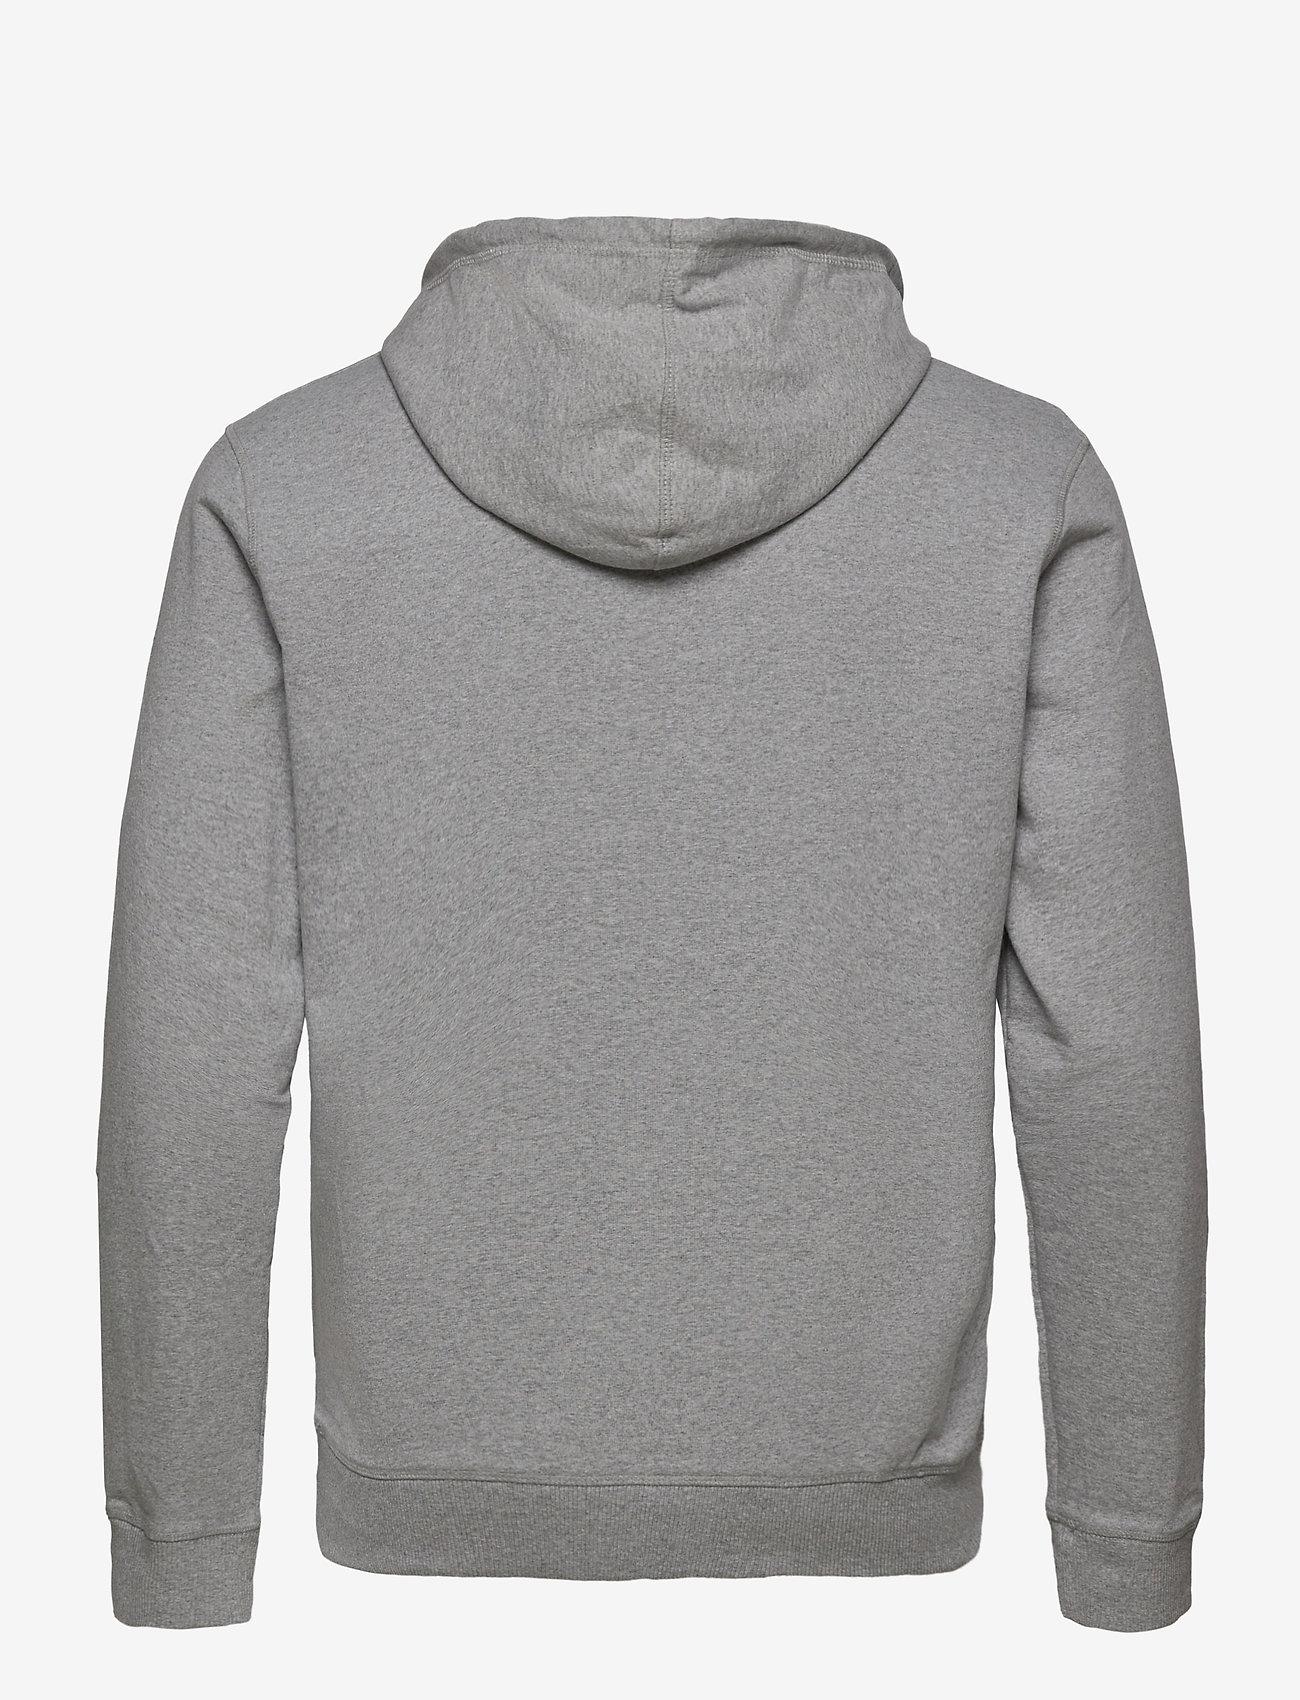 Minimum storms - Sweatshirts LIGHT GREY MELANGE - Menn Klær